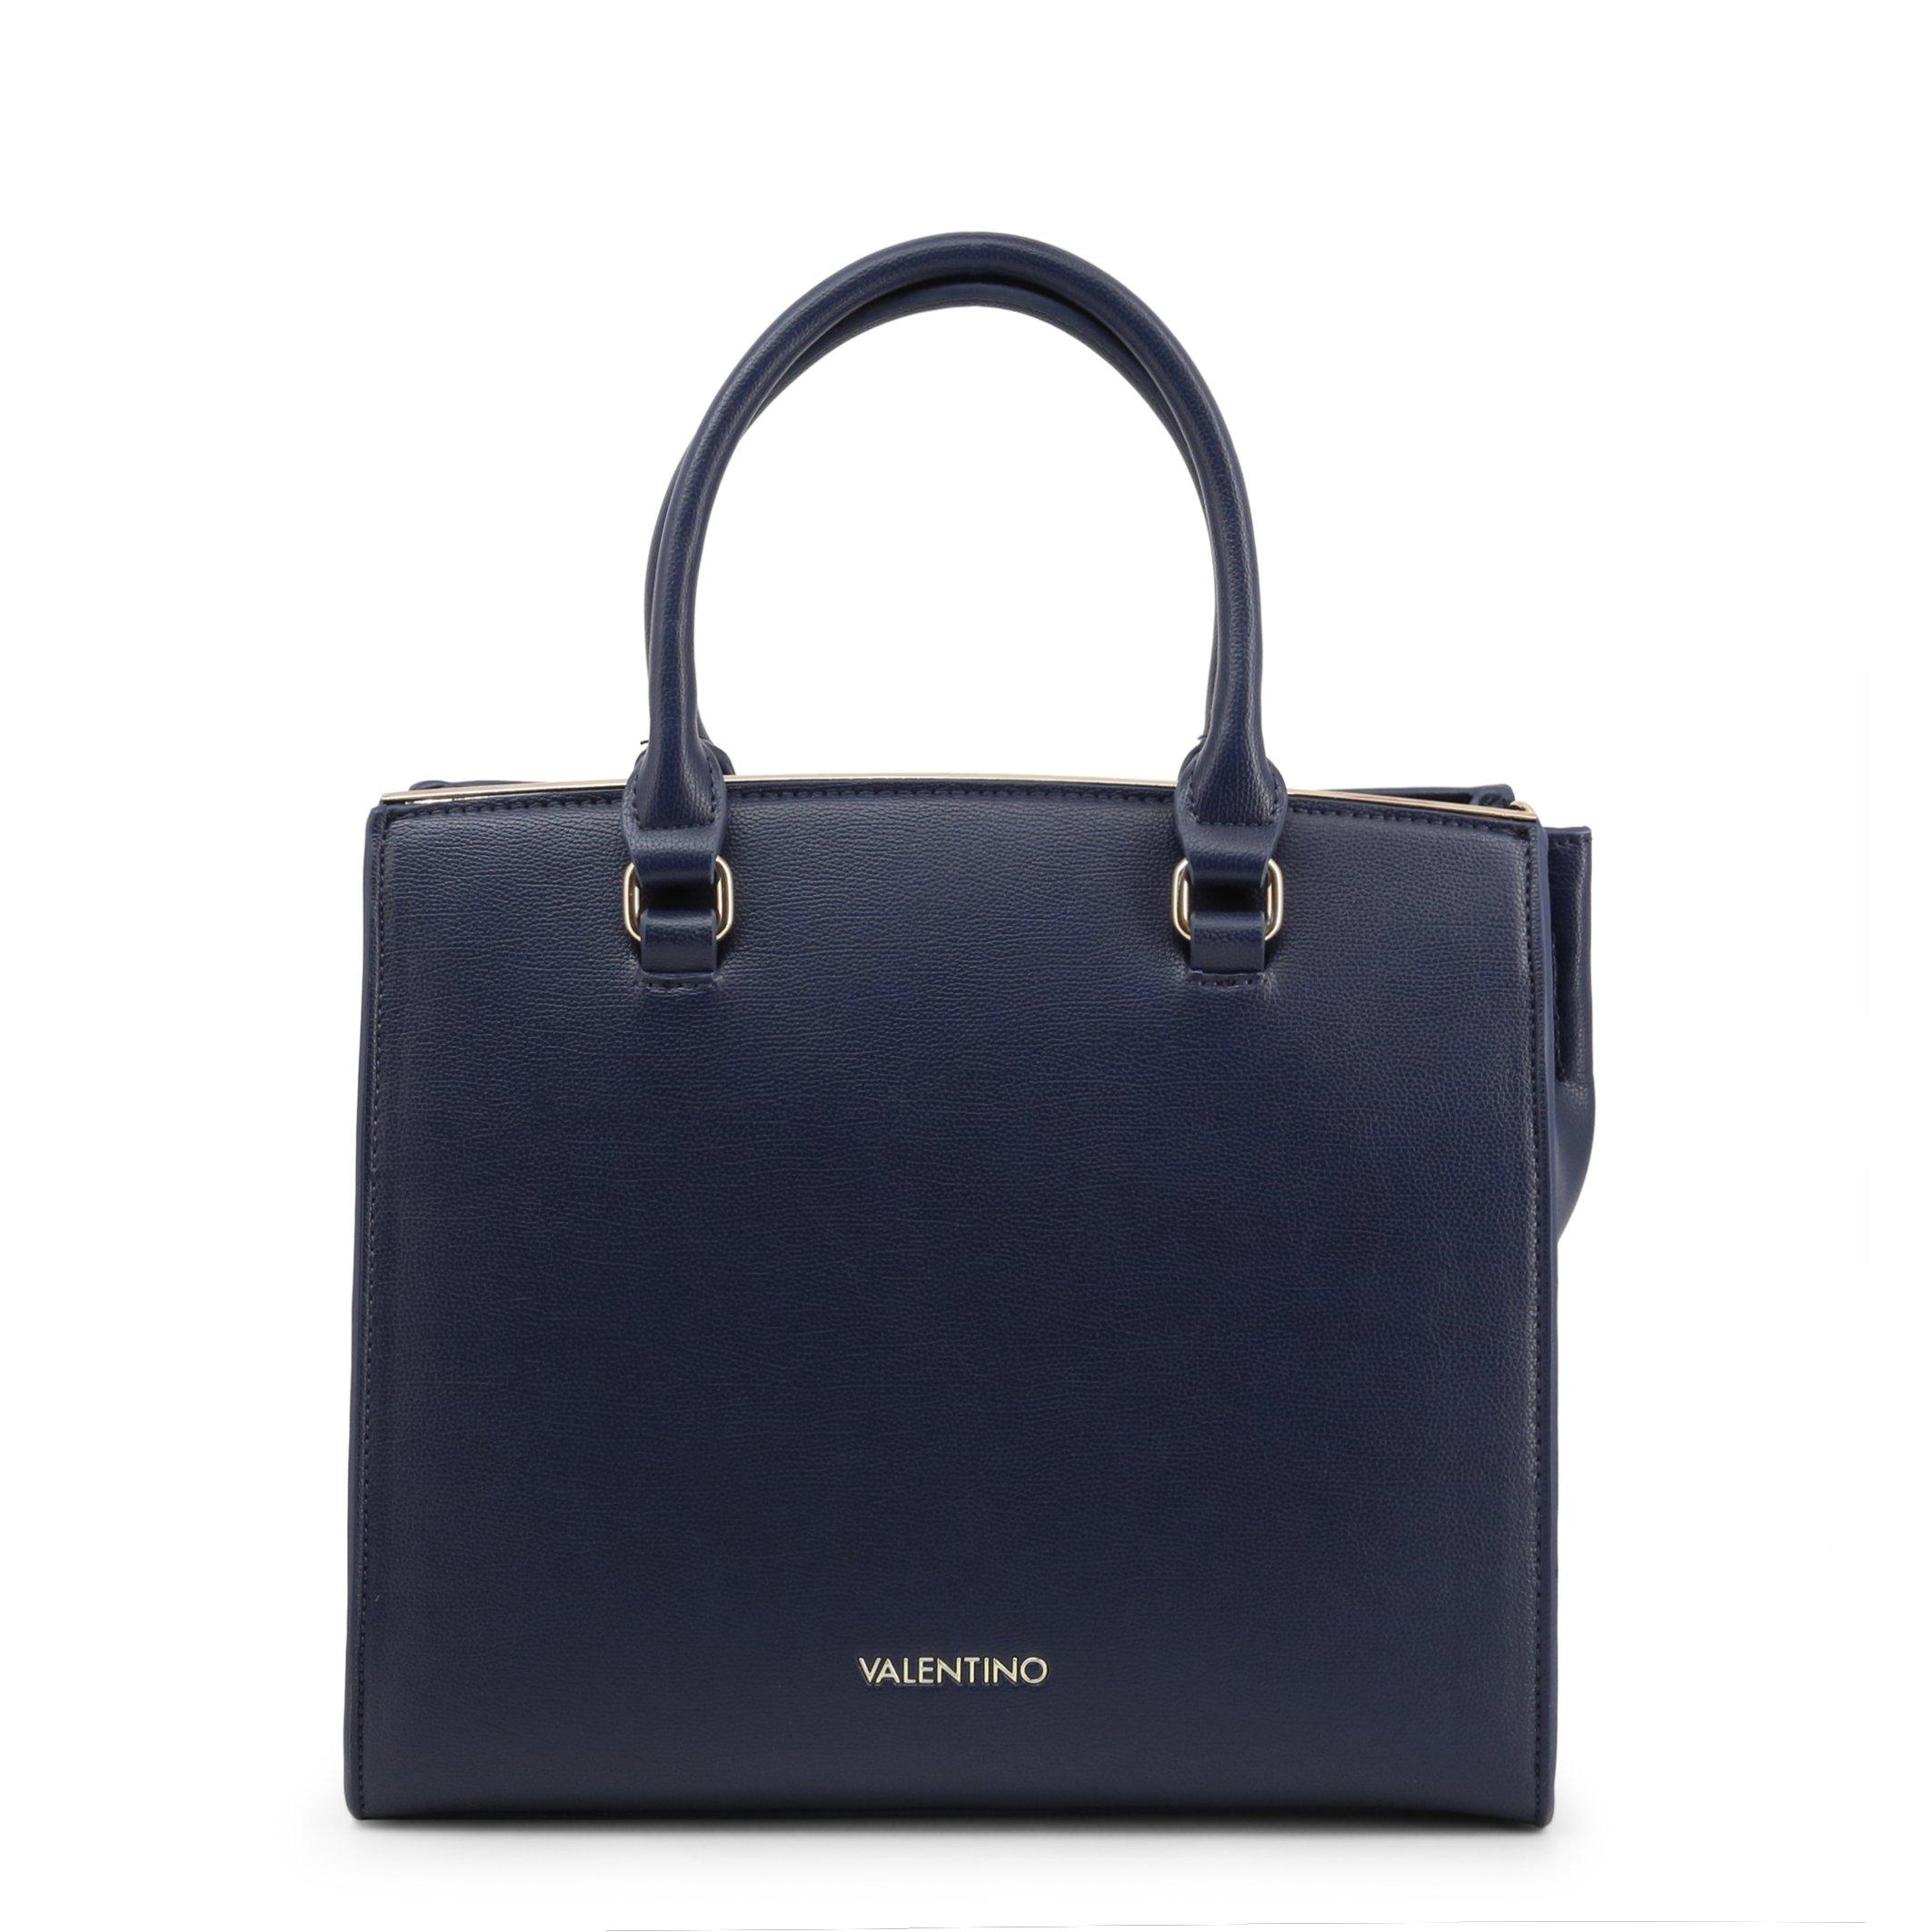 Valentino by Mario Valentino Women's Handbag Red UNICORNO-VBS3TT01 - blue NOSIZE